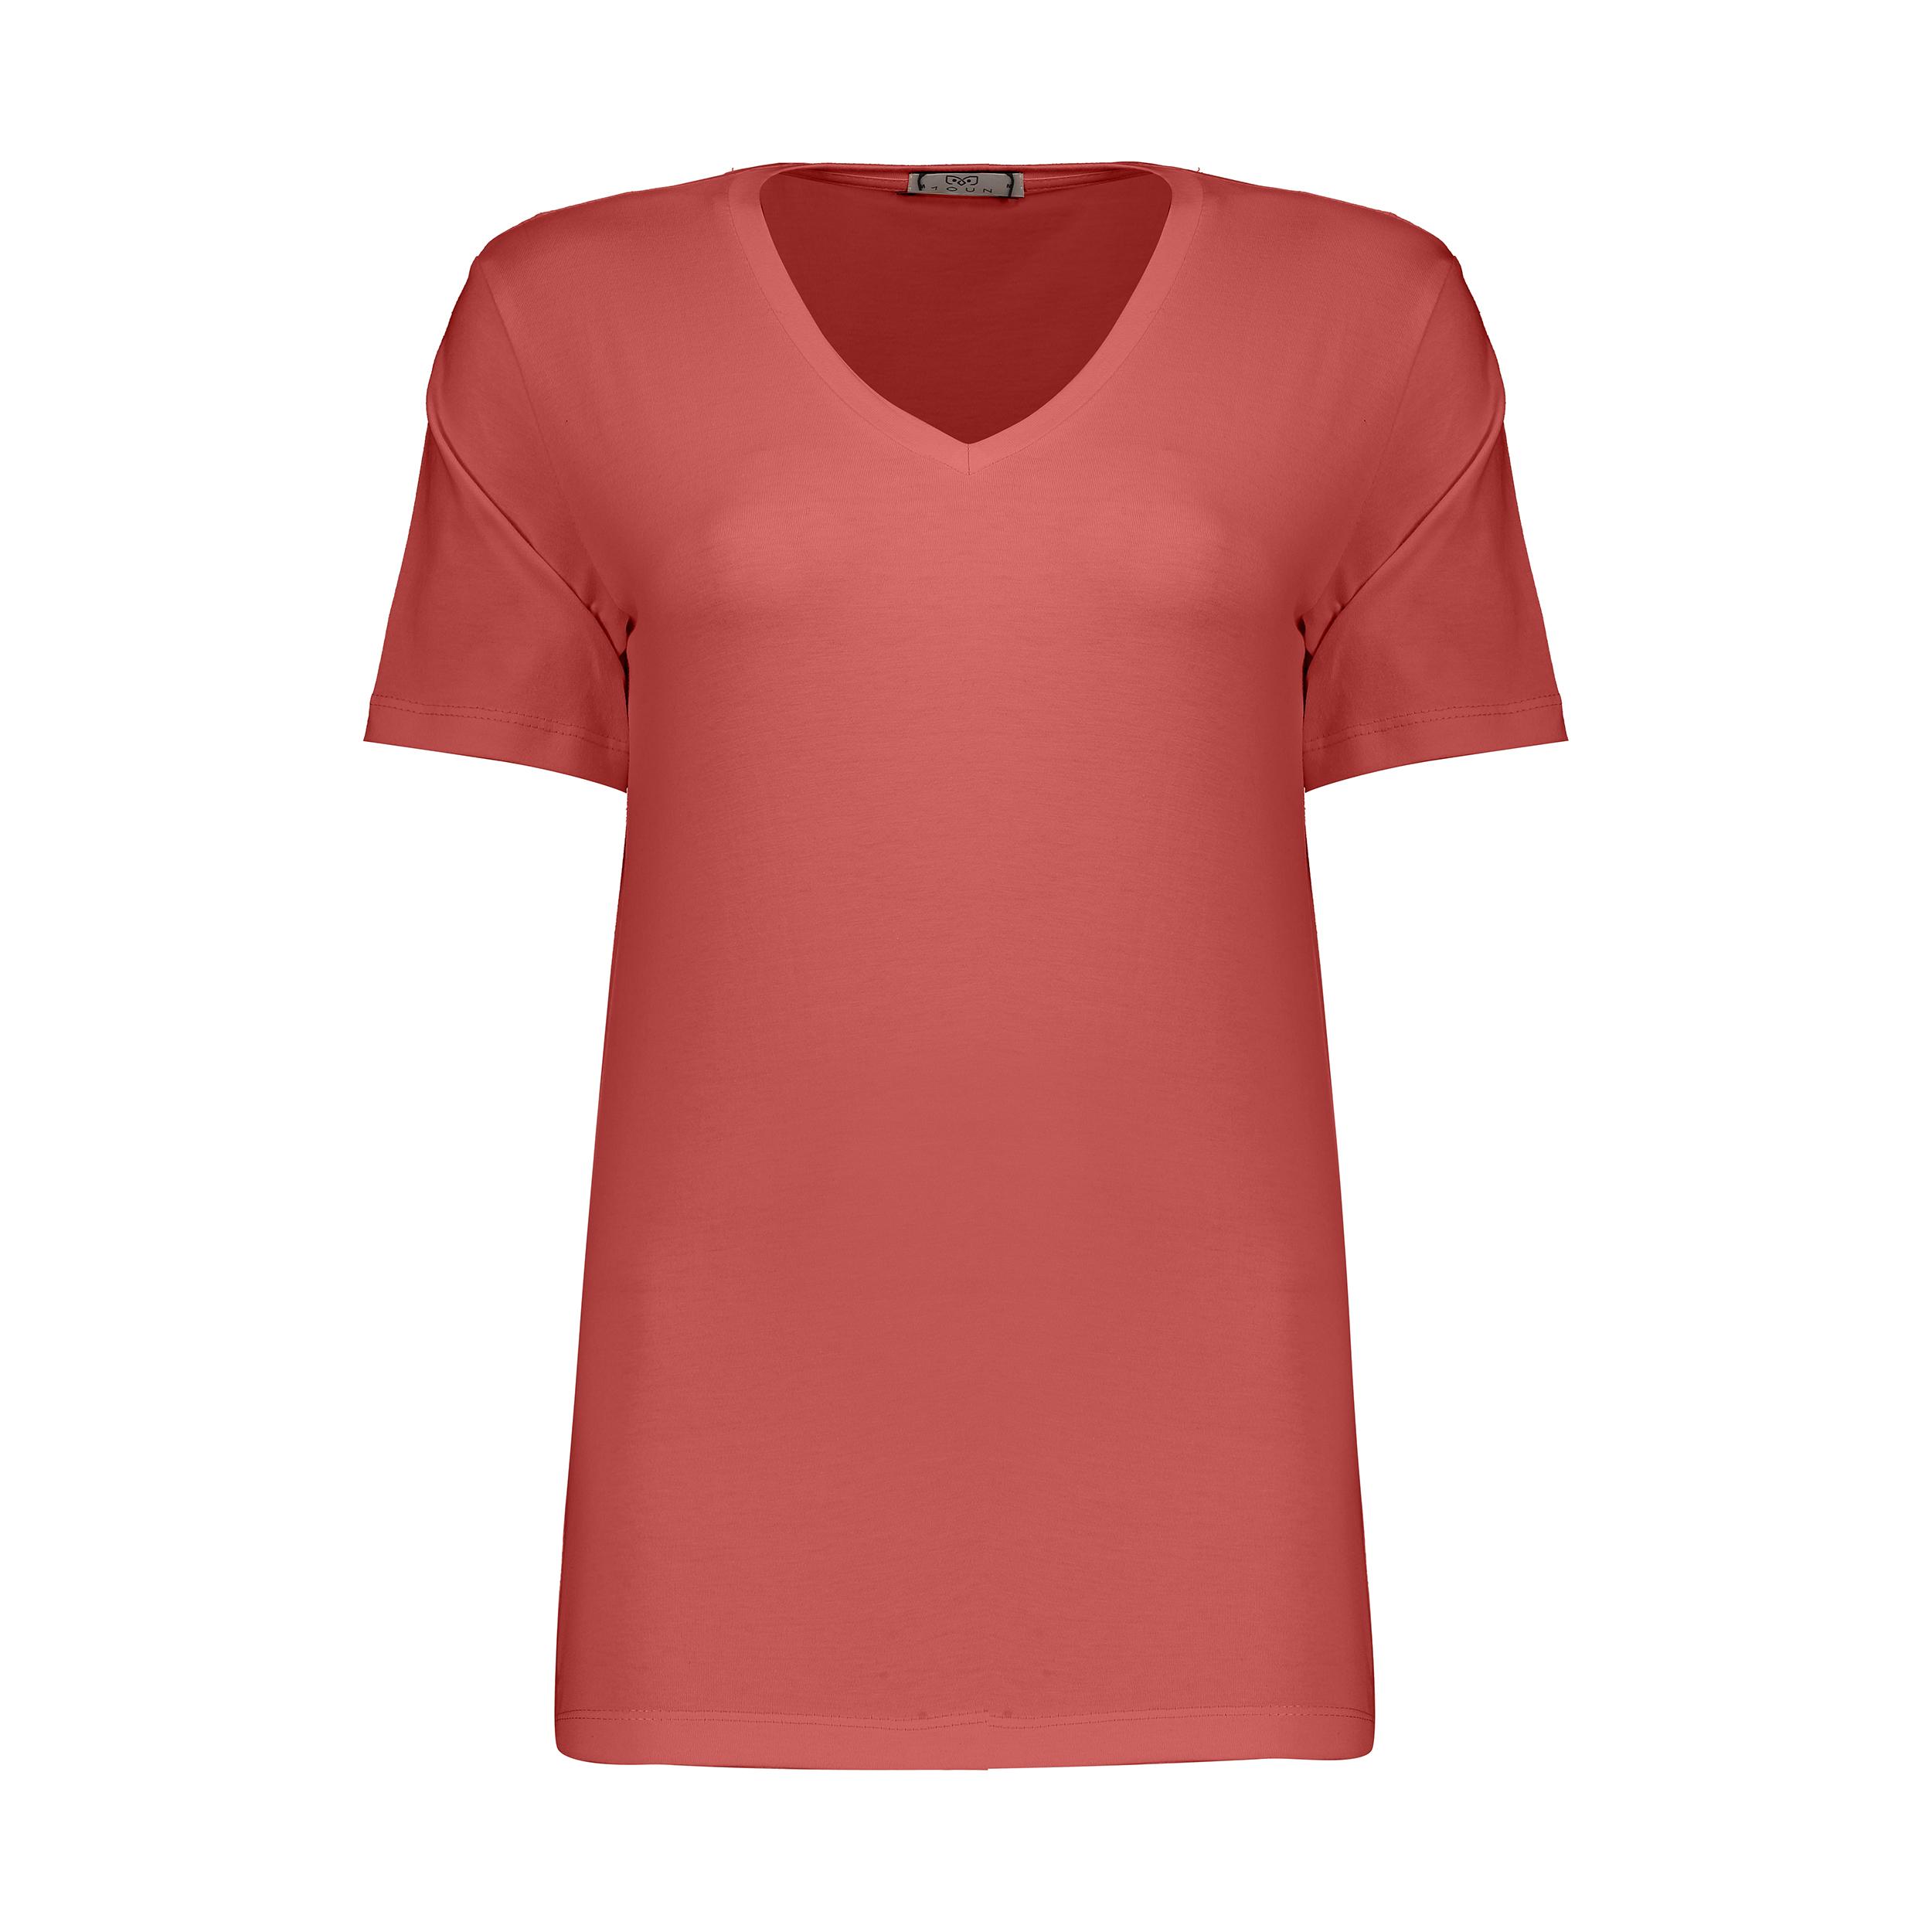 Photo of تی شرت زنانه مون مدل 163113873